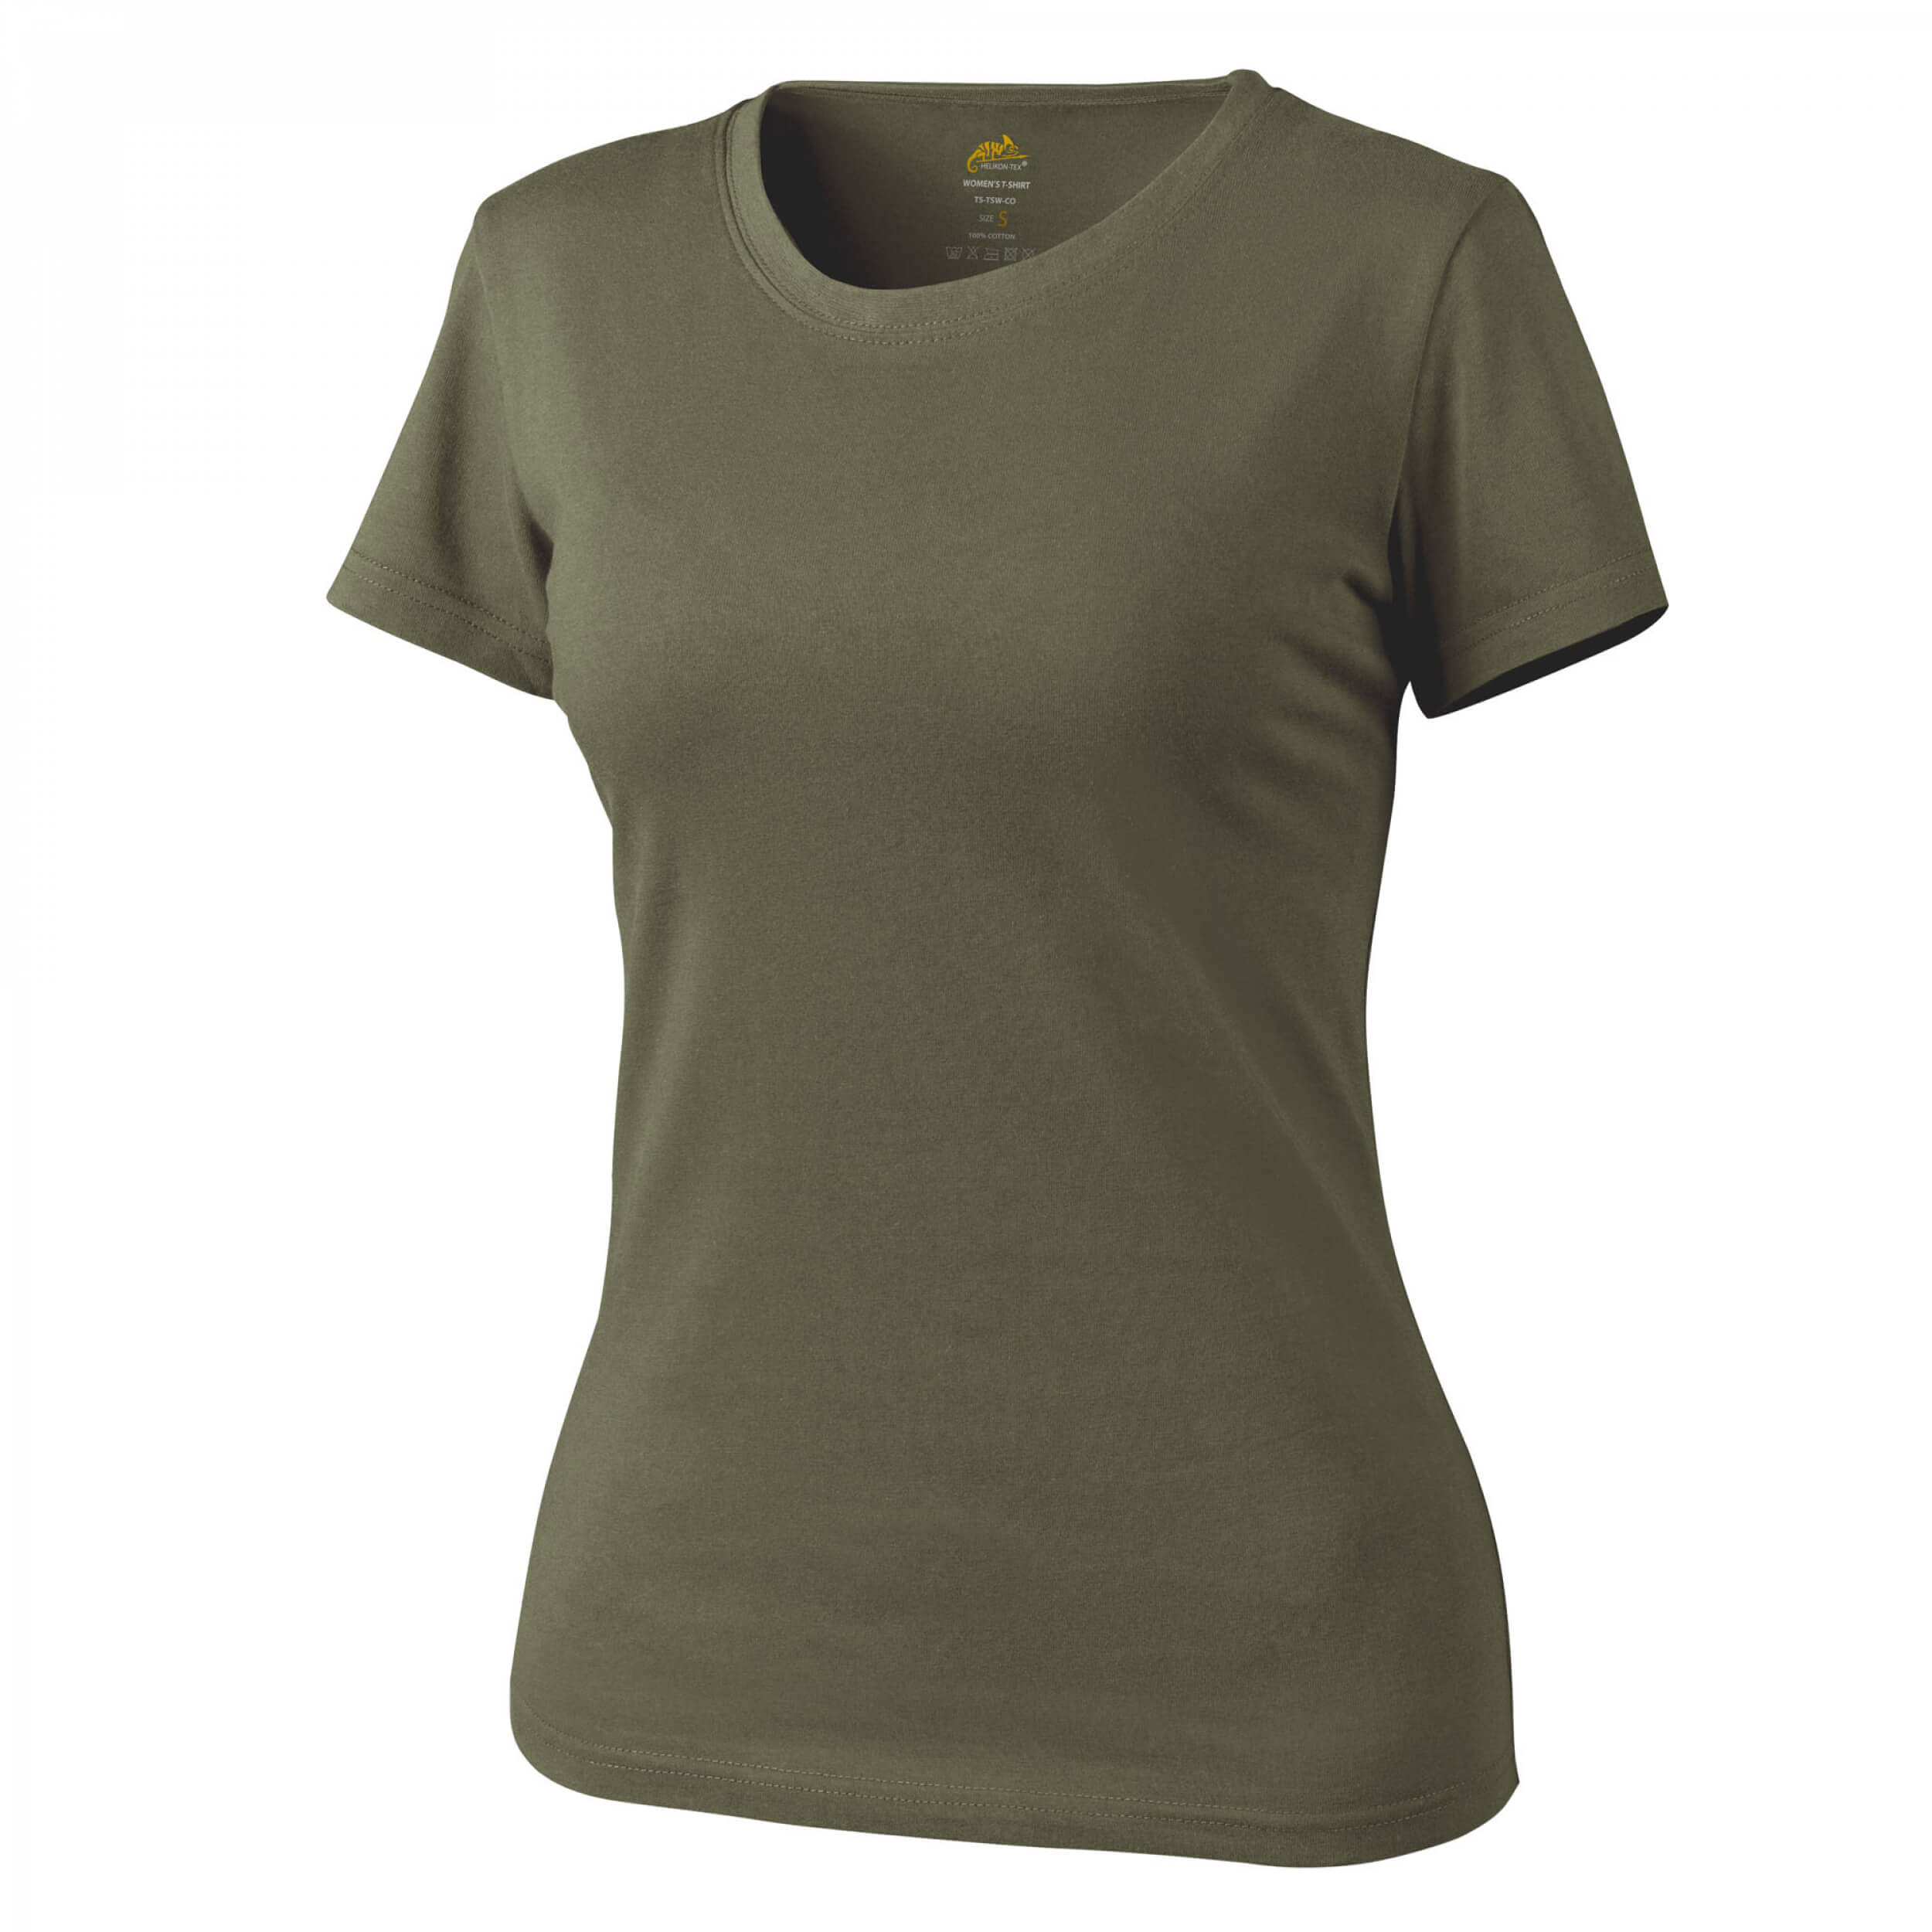 Helikon-Tex Womens T-Shirt Cotton - Olive Green